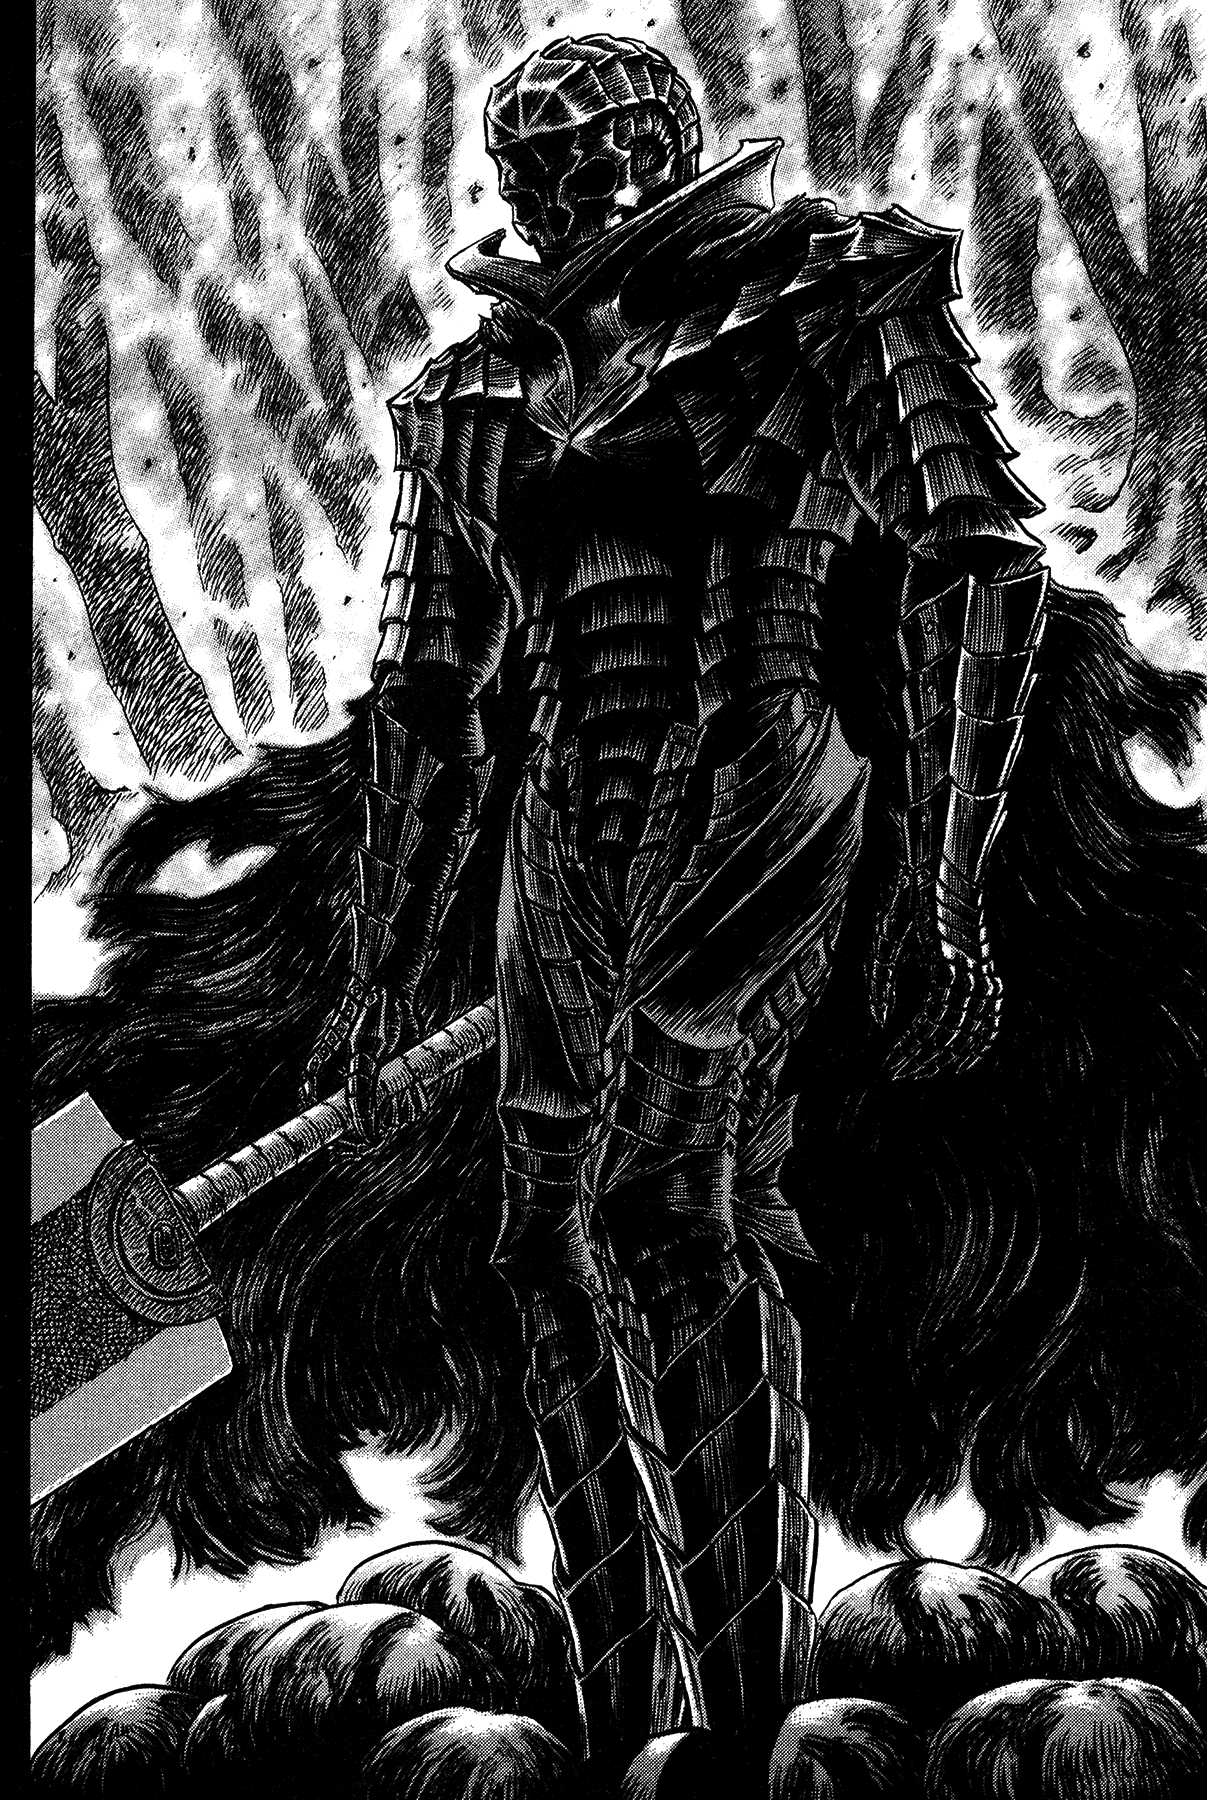 Anime 1207x1800 Berserk berserk armor Guts Kentaro Miura